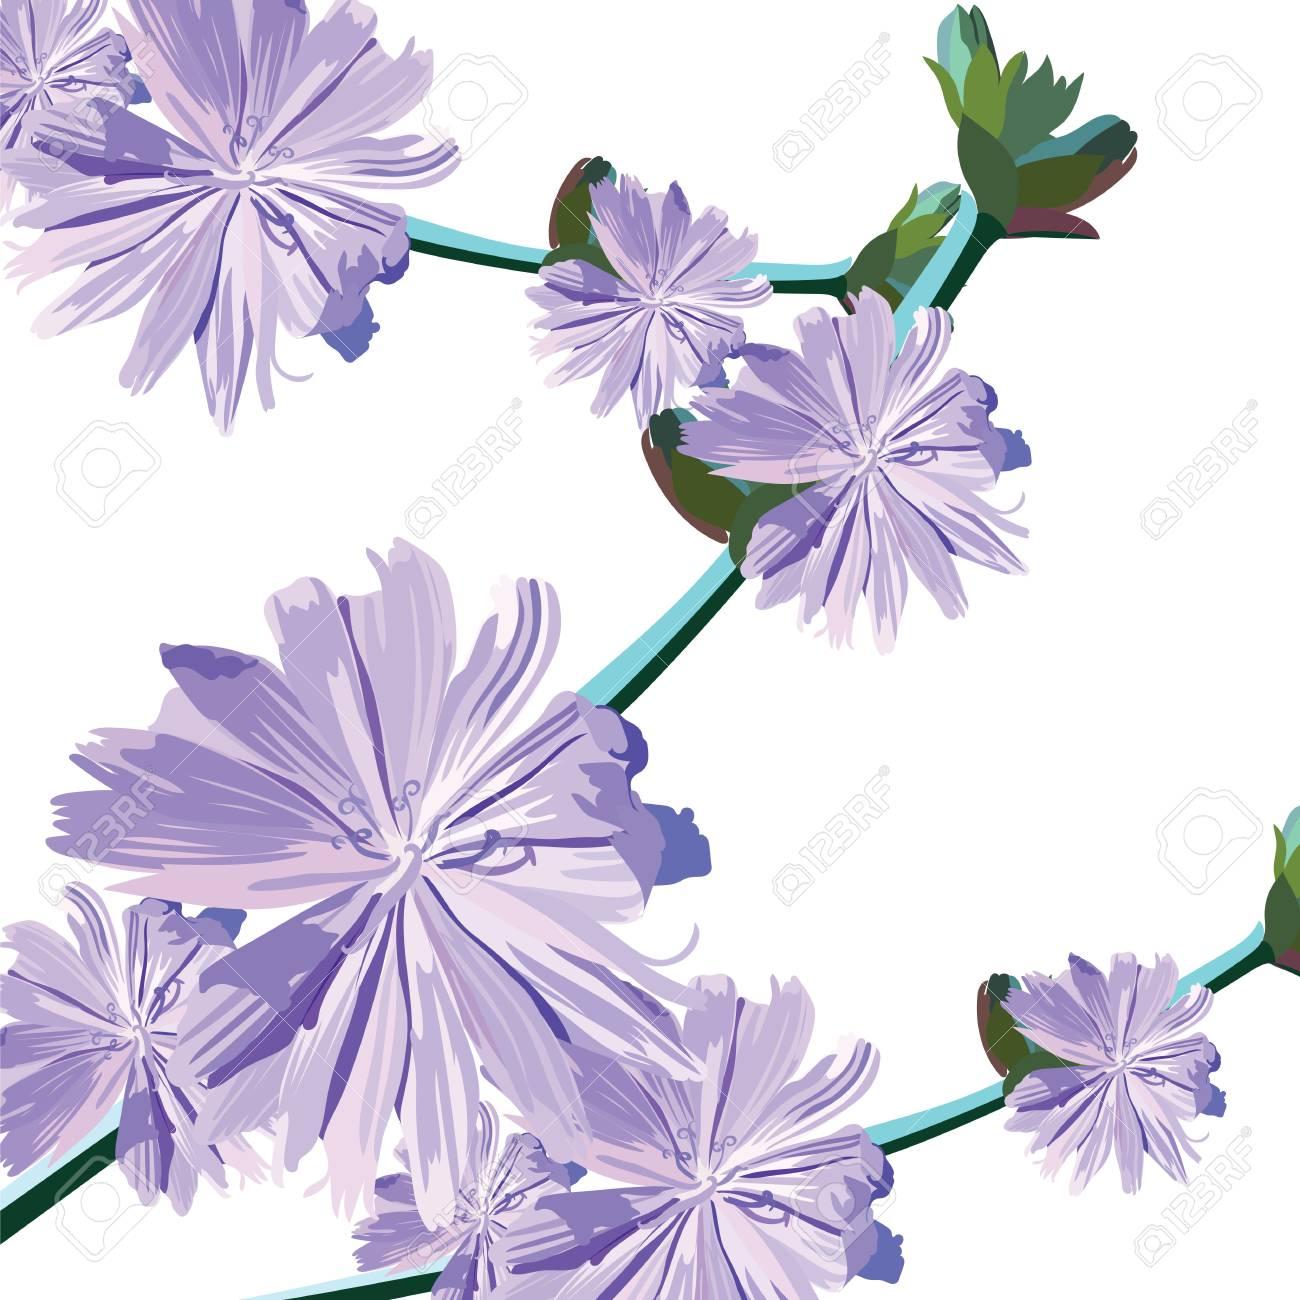 Watercolor delicate purple flowers bouquet vintage elegant watercolor delicate purple flowers bouquet vintage elegant illustration for womens day birthday wedding izmirmasajfo